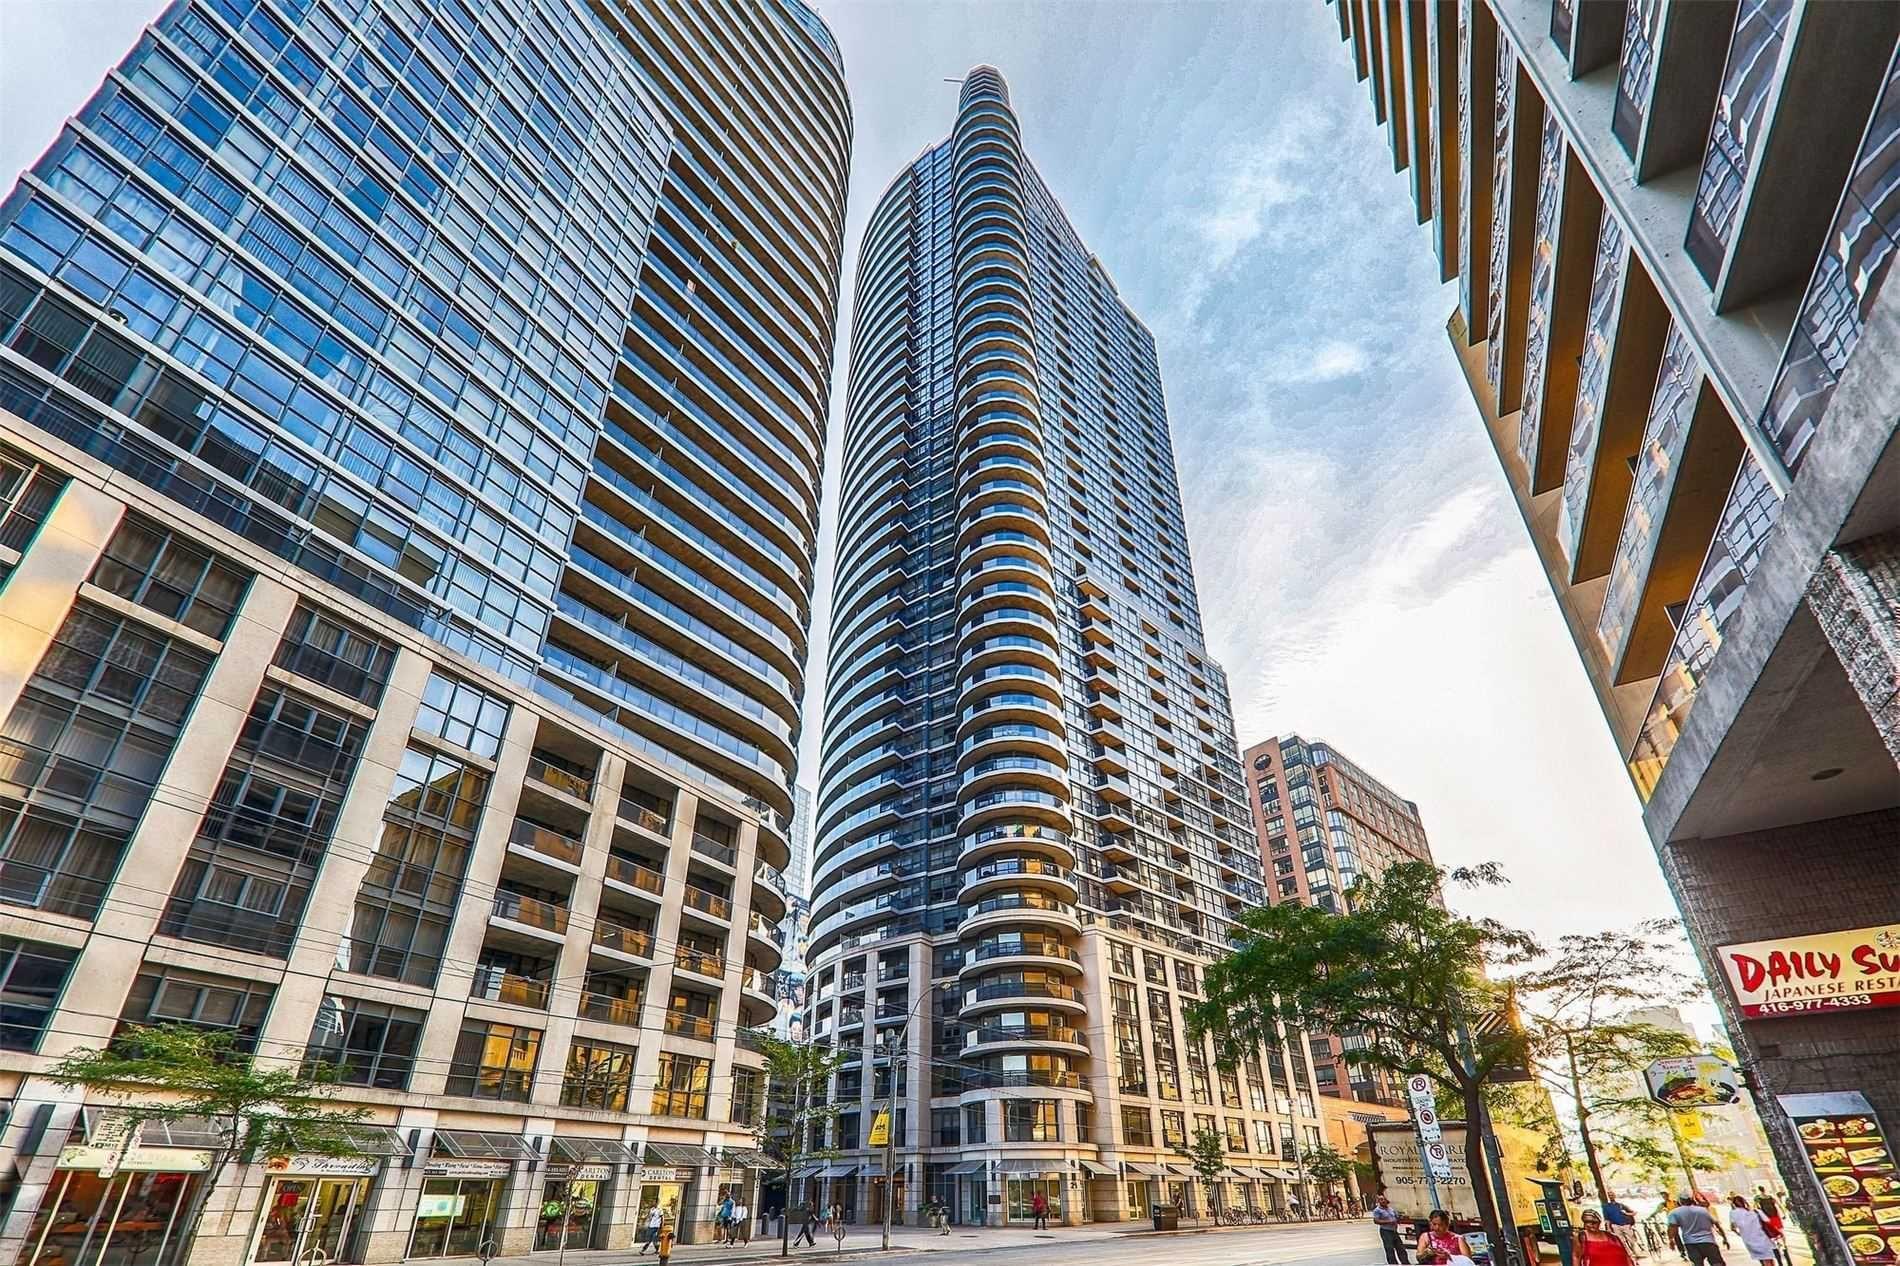 Main Photo: 2210 21 Carlton Street in Toronto: Church-Yonge Corridor Condo for lease (Toronto C08)  : MLS®# C5292049